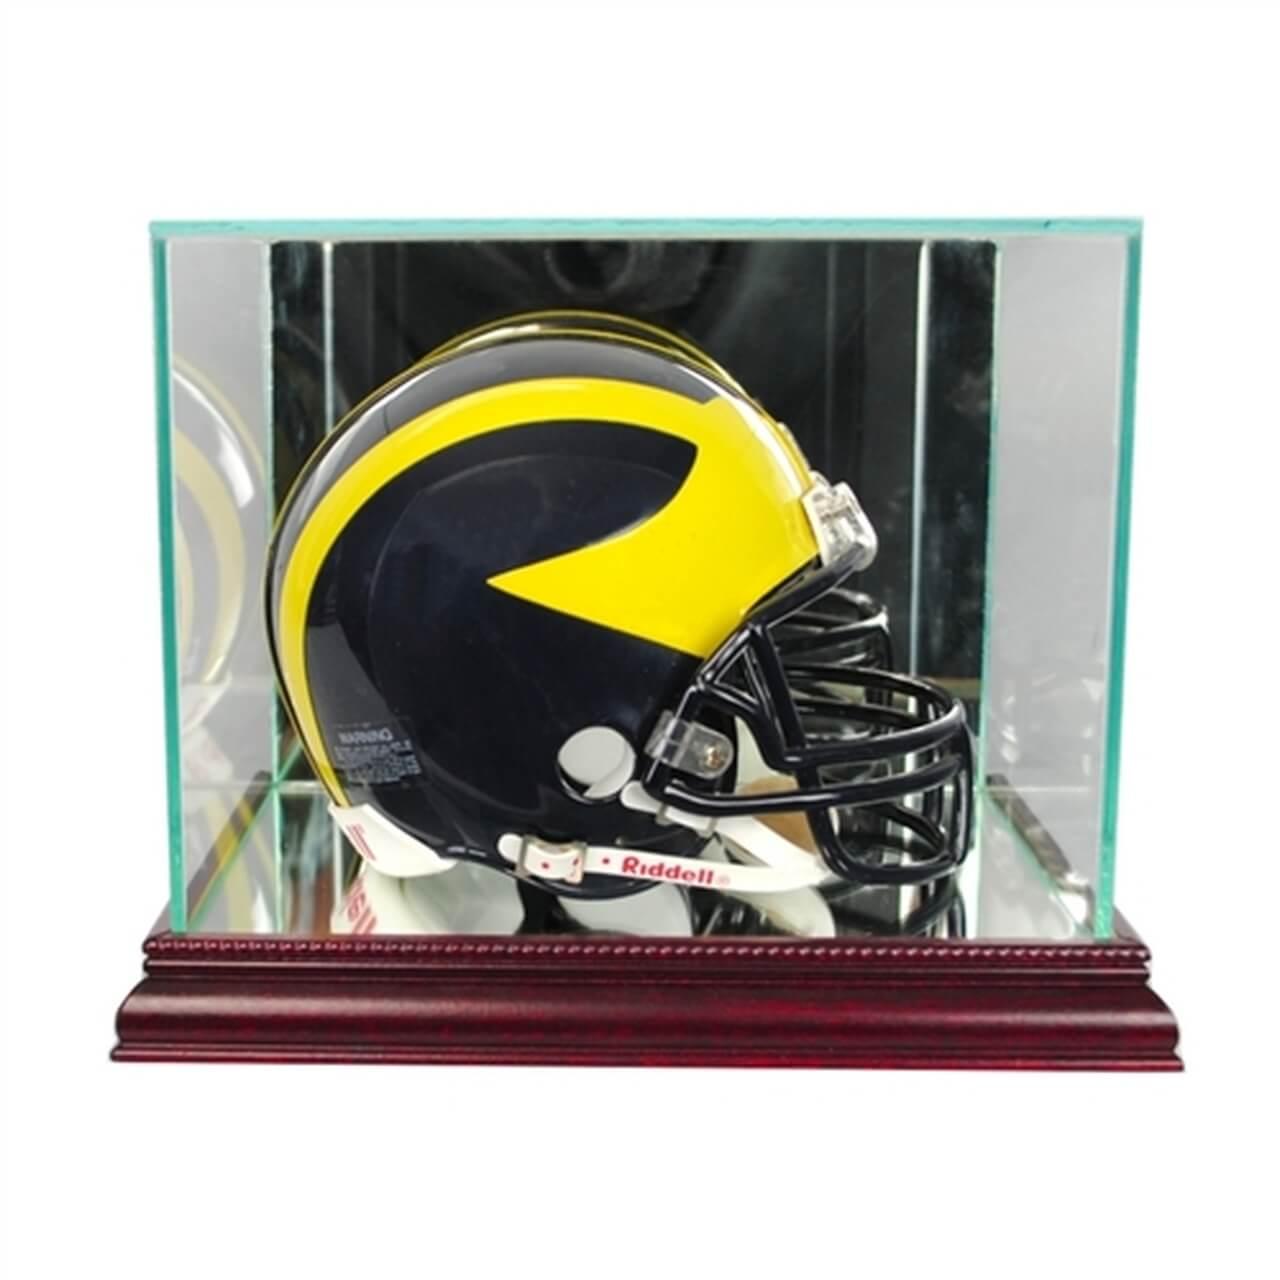 A mini football helmet in a display case